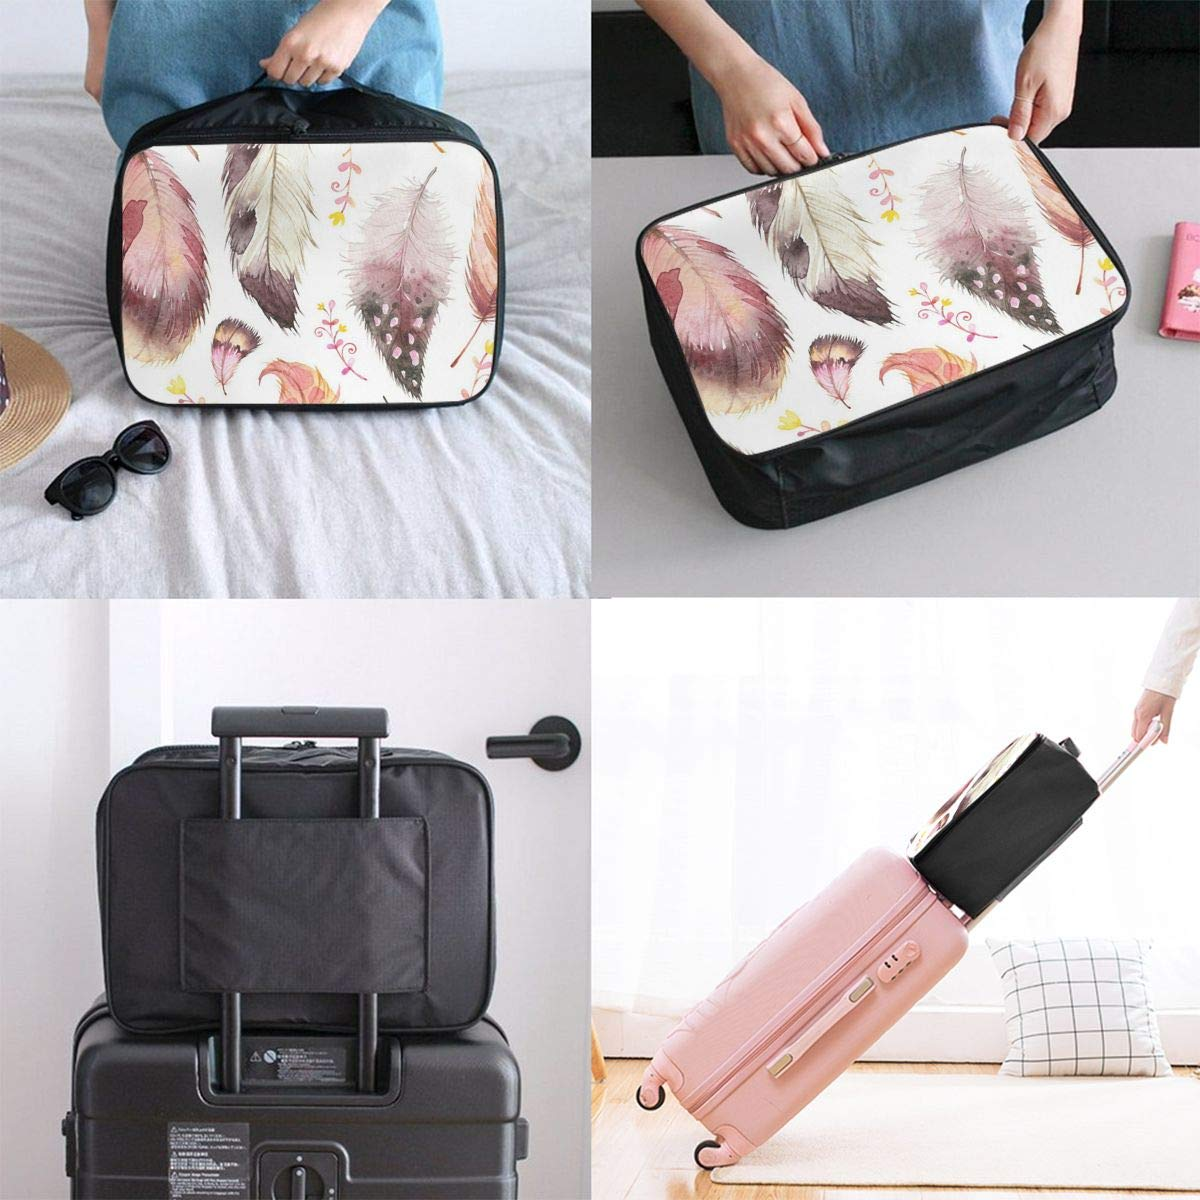 Travel Luggage Duffle Bag Lightweight Portable Handbag Feather Print Large Capacity Waterproof Foldable Storage Tote